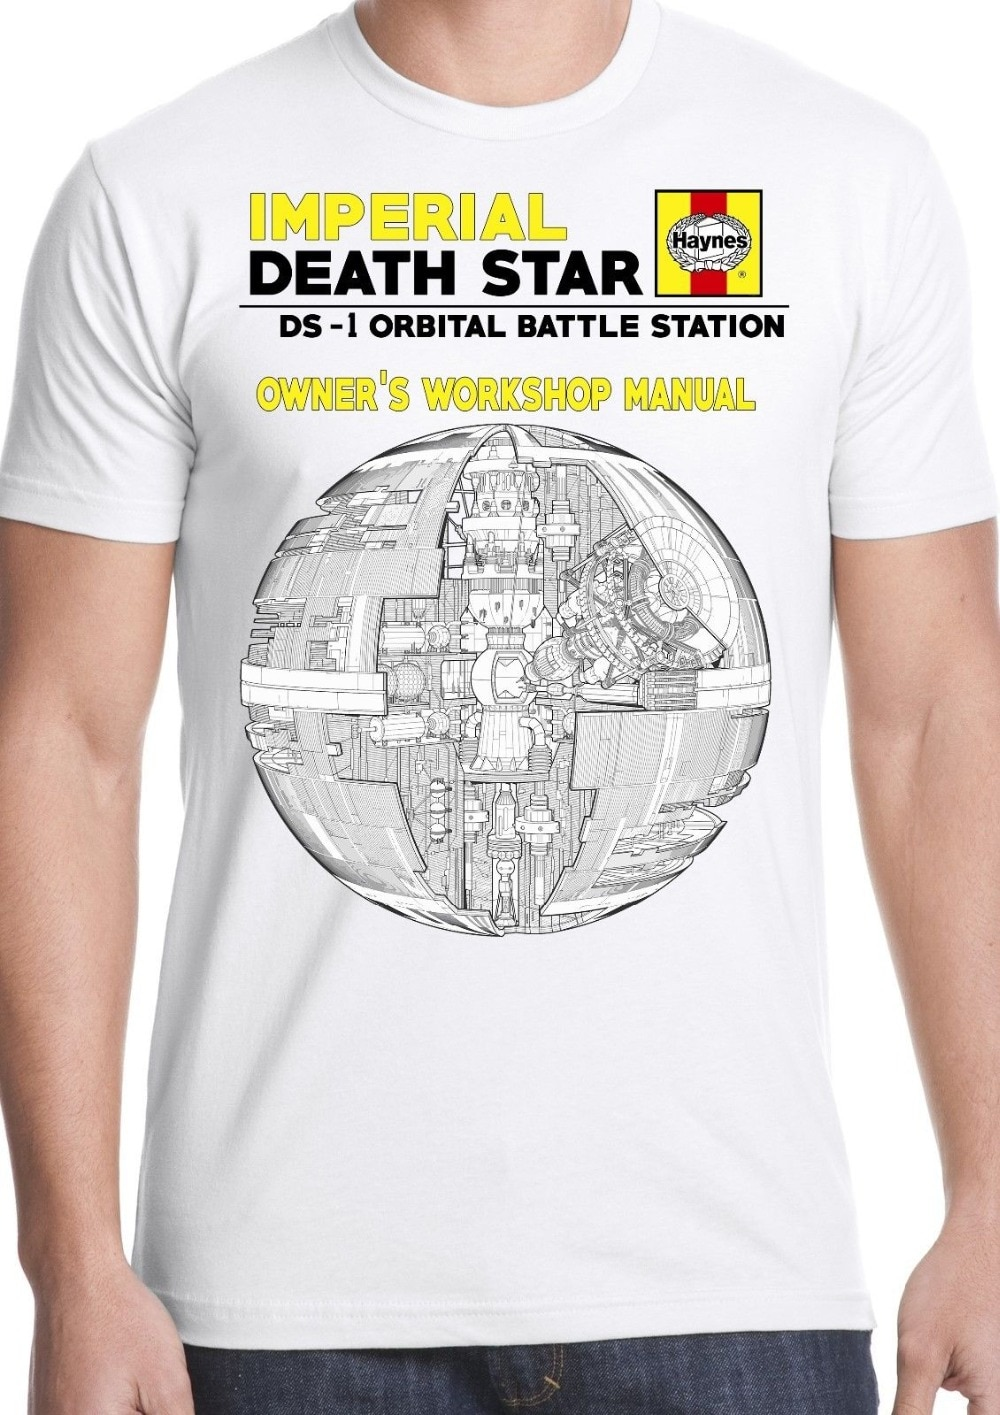 Tee-shirt Star Wars Strom Trooper Jedi Sith dark manuel Forcesummer 2019 coton hommes mode été Style